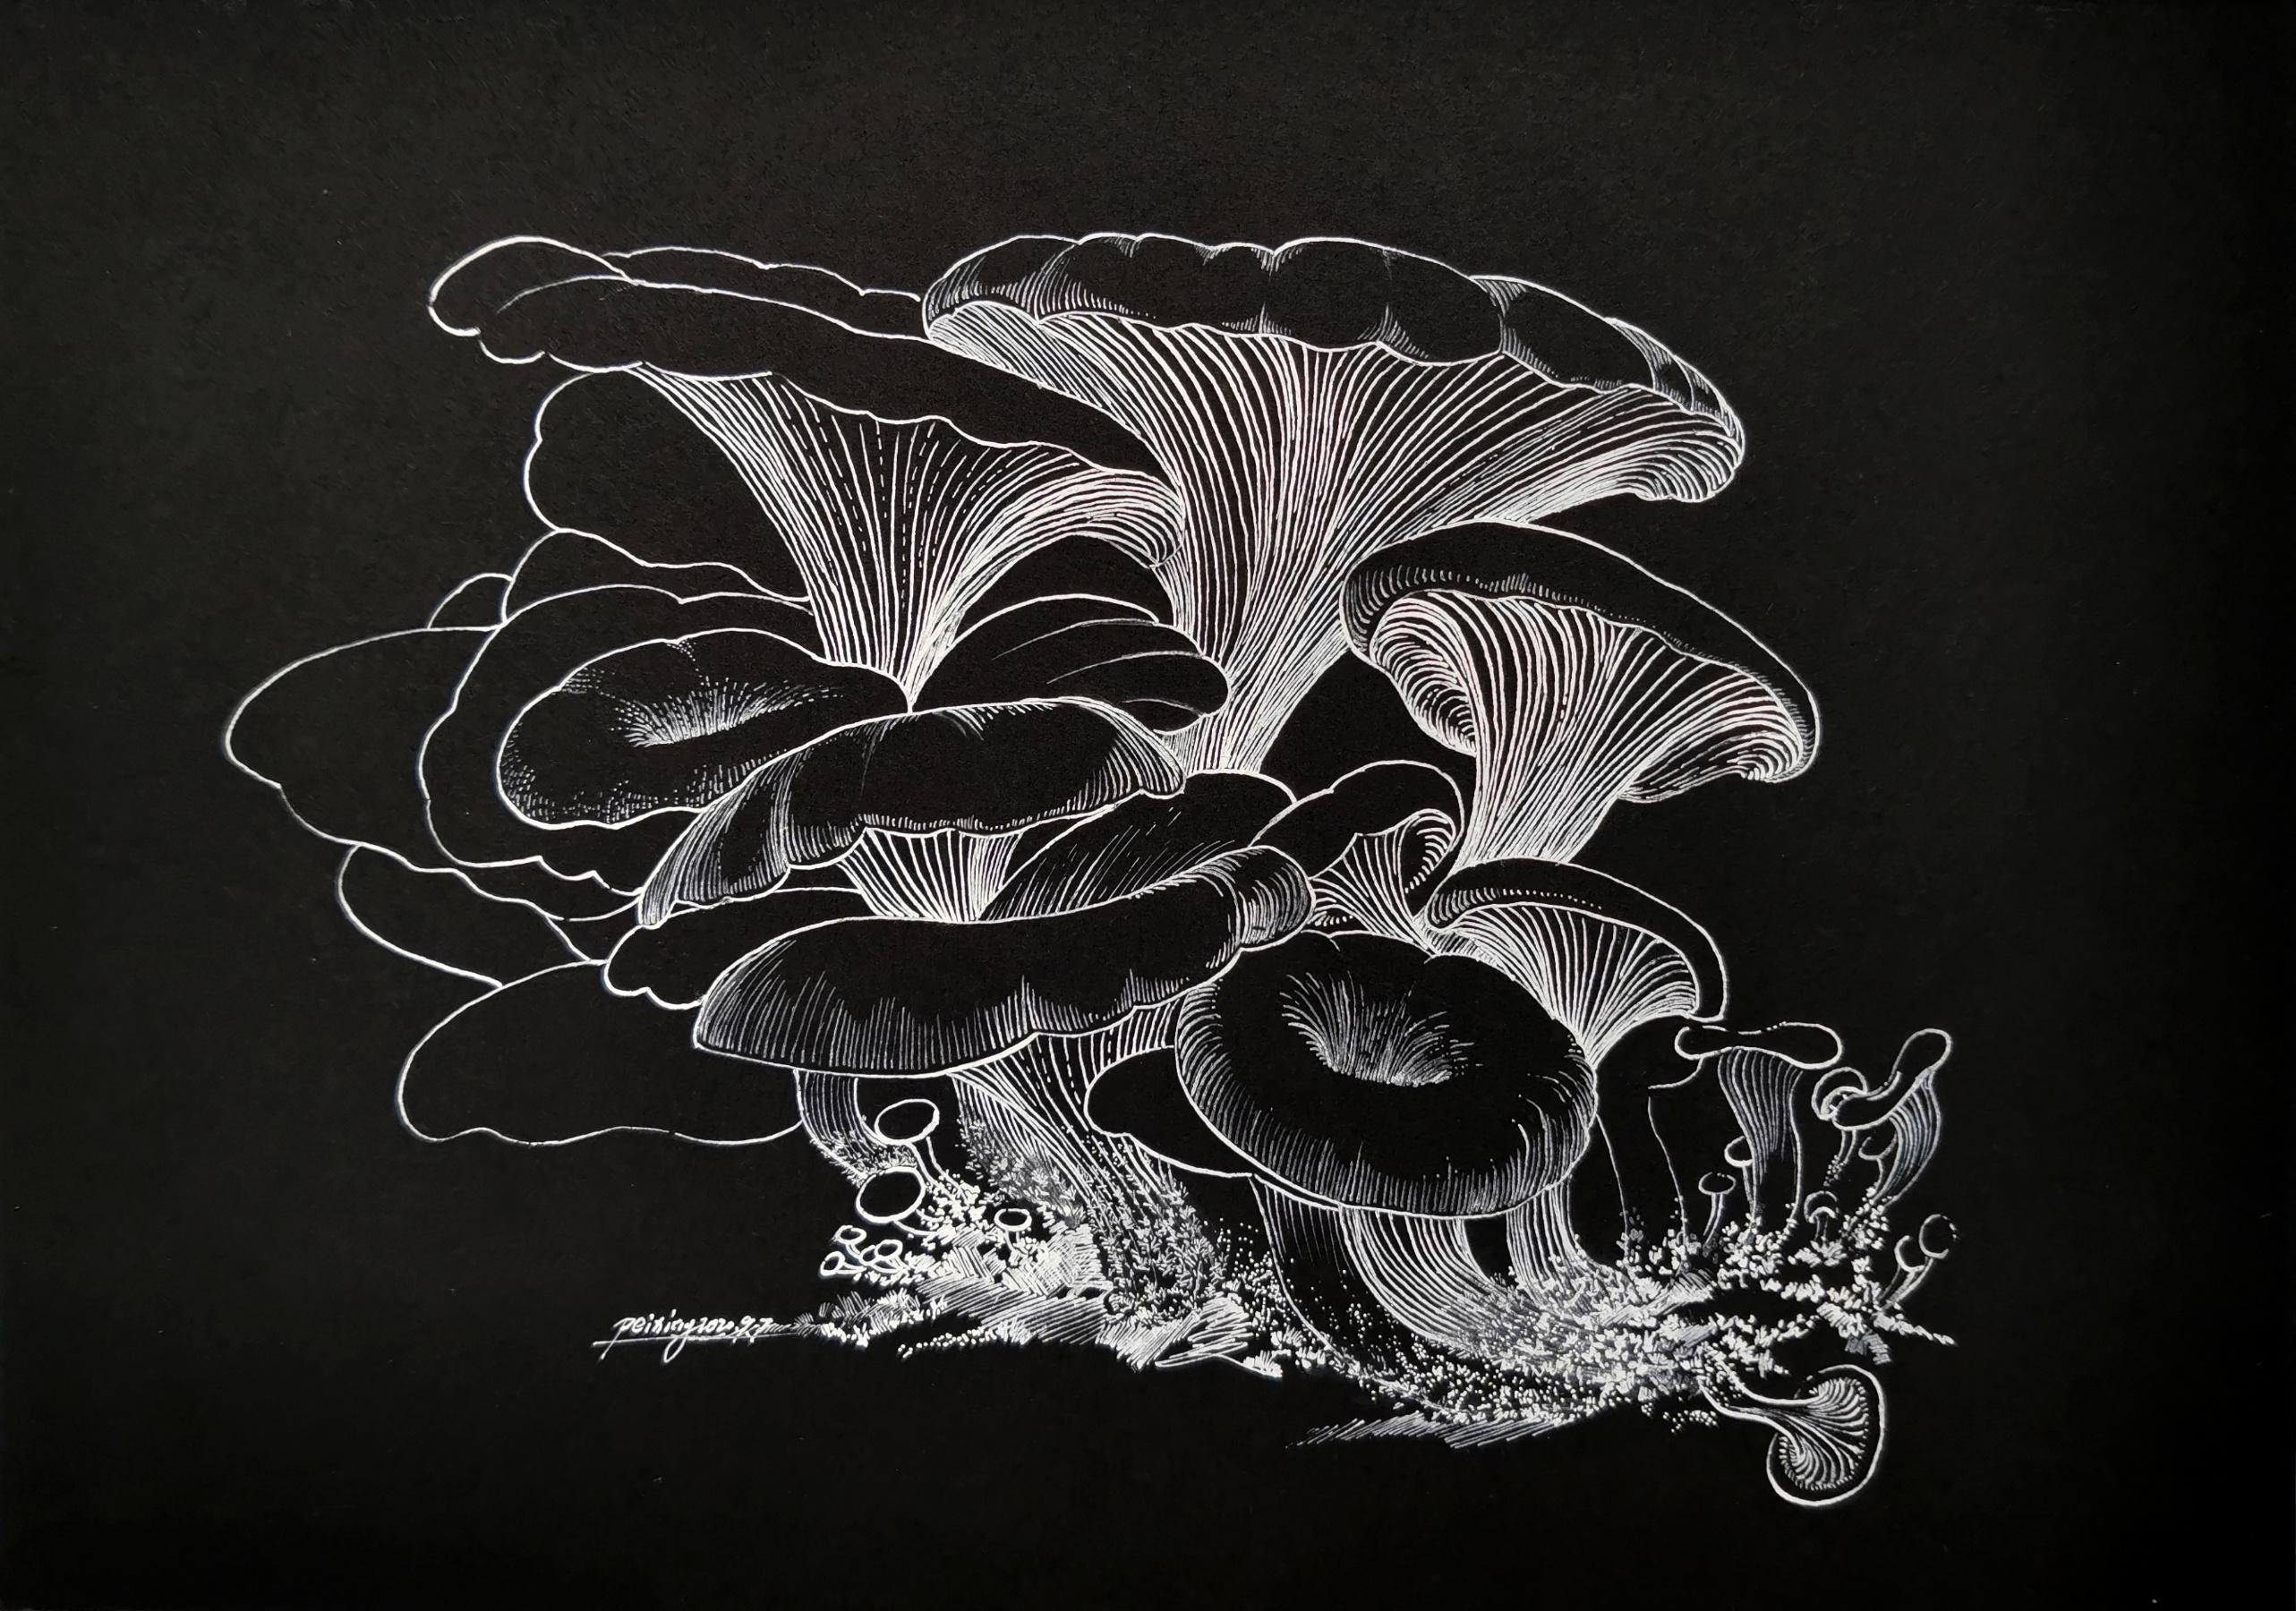 Oyster mushroon